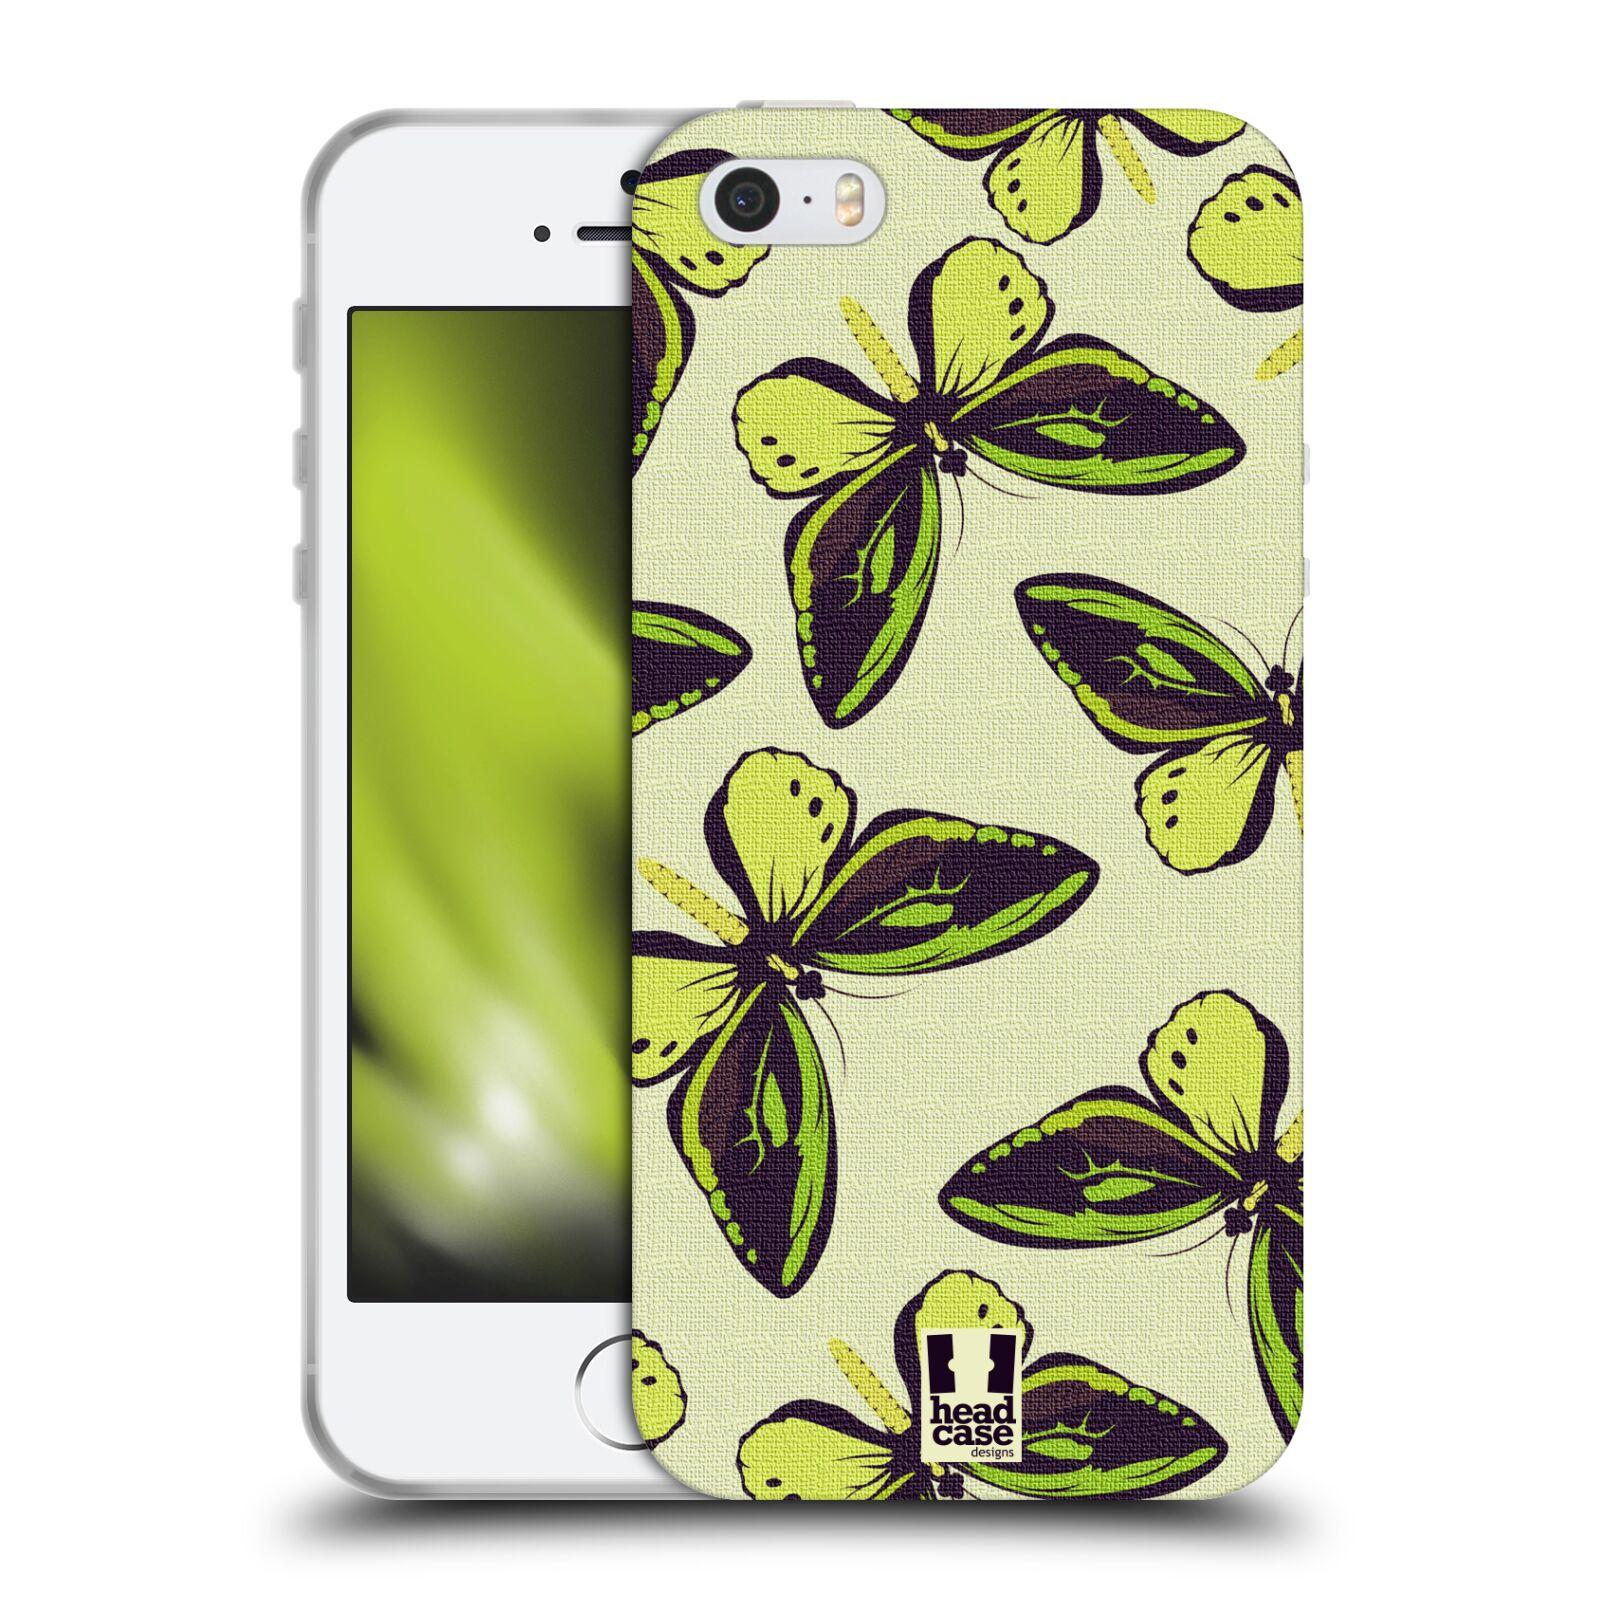 HEAD CASE silikonový obal na mobil Apple Iphone 5/5S vzor Motýlci Poseidon zelená